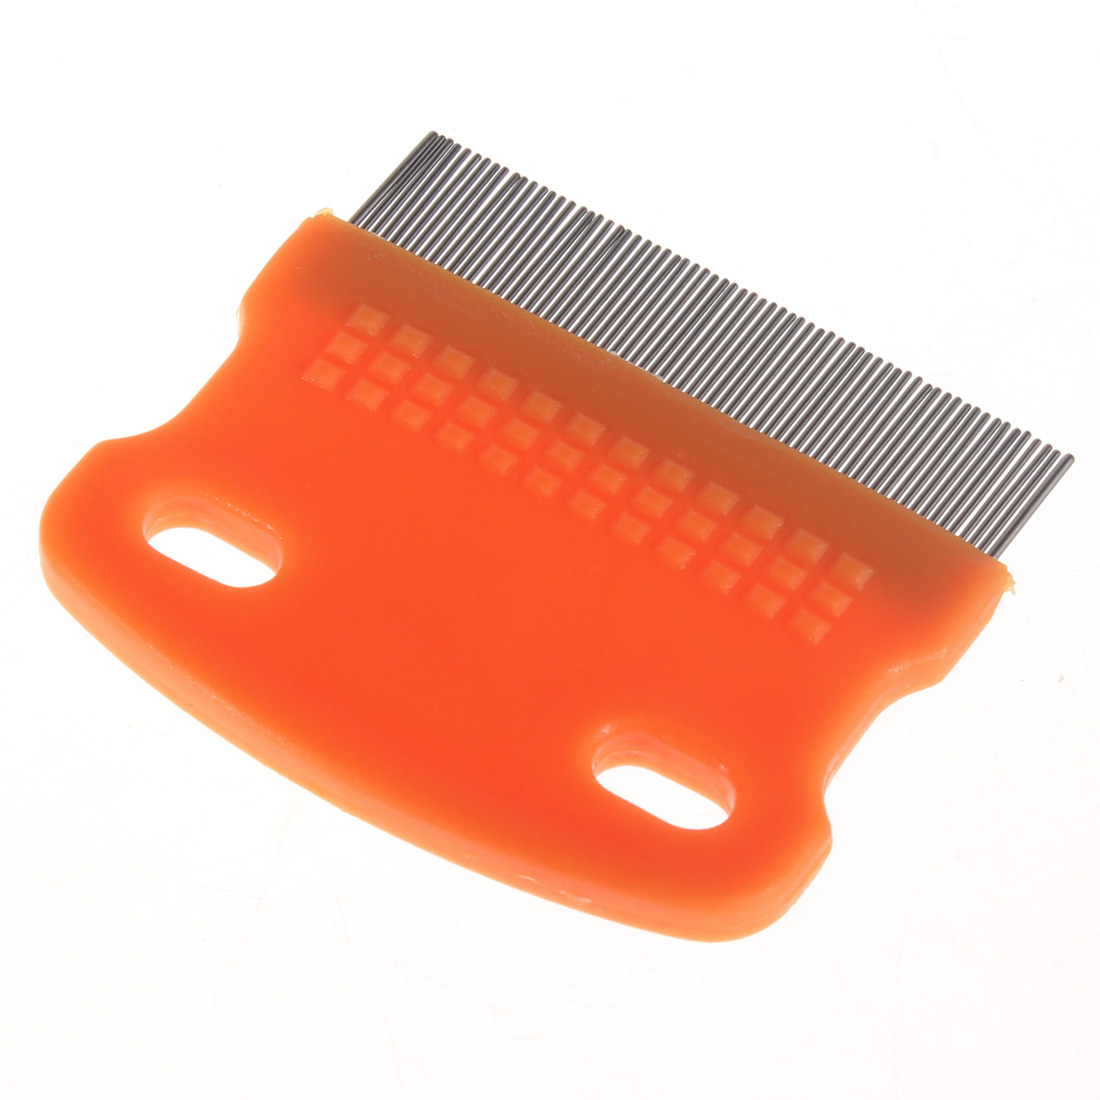 New Pet Dog Cat Hair Flea Shedding Comb Grooming Pin Brush